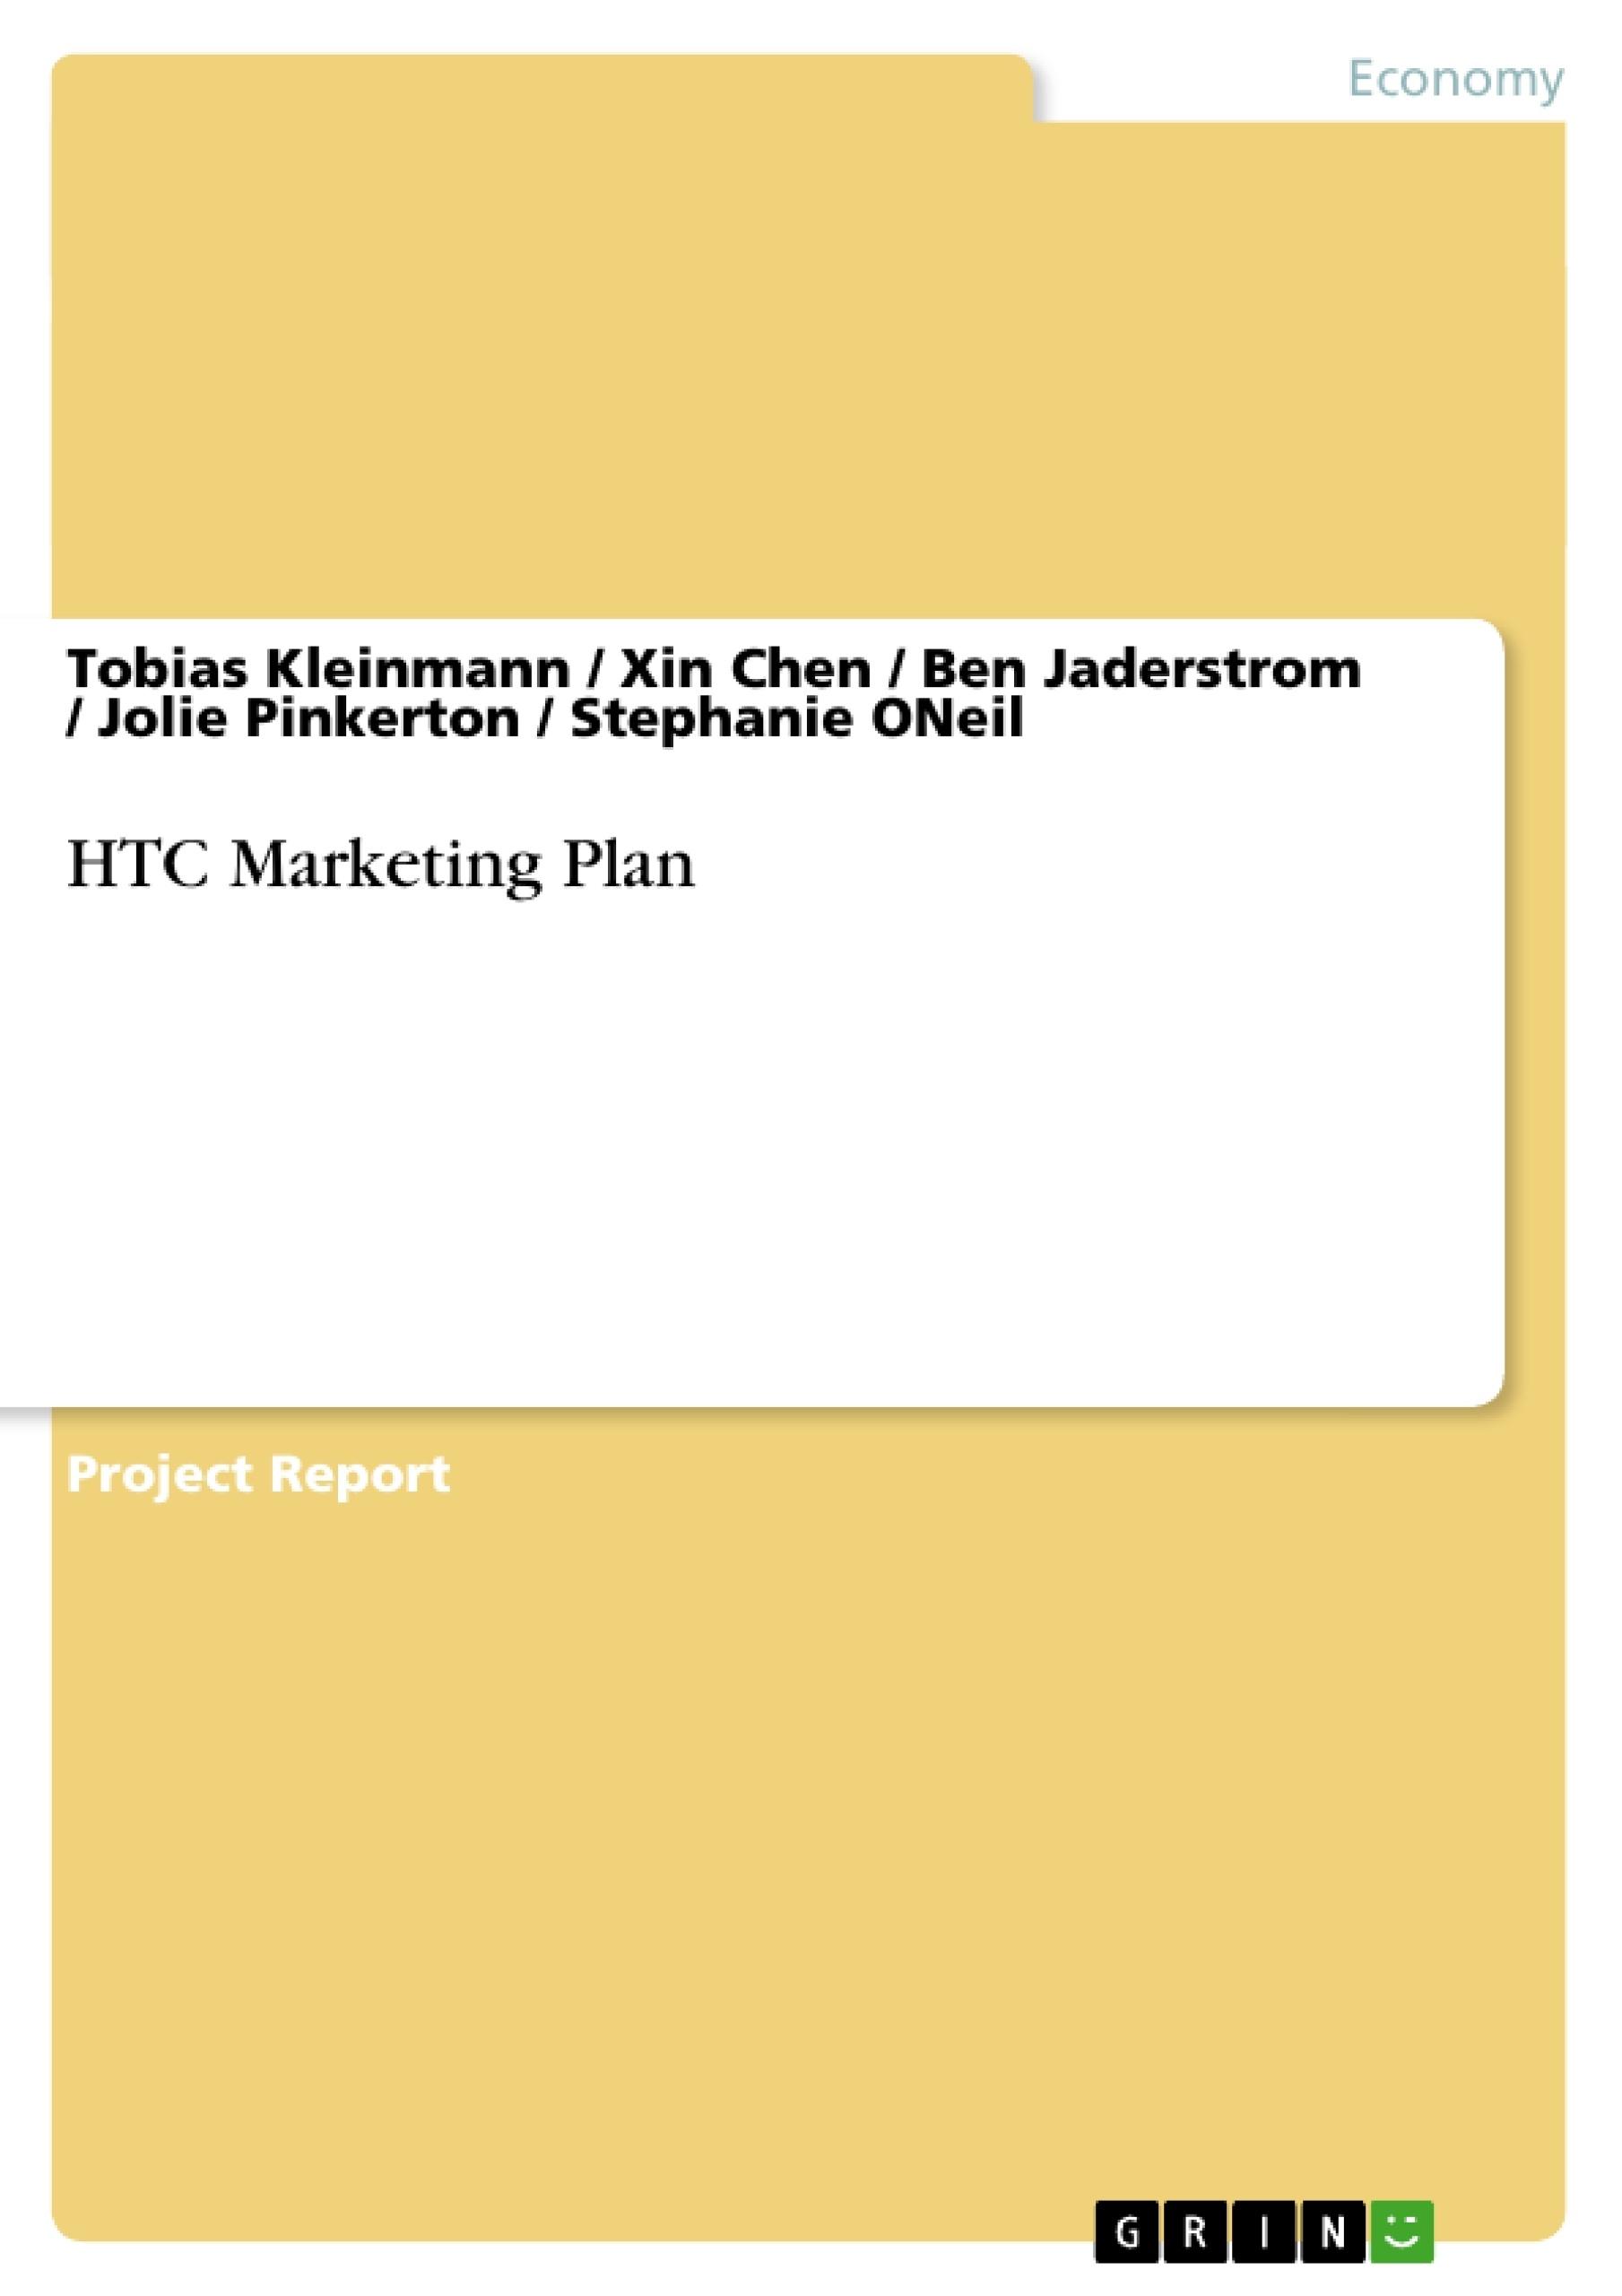 Title: HTC Marketing Plan